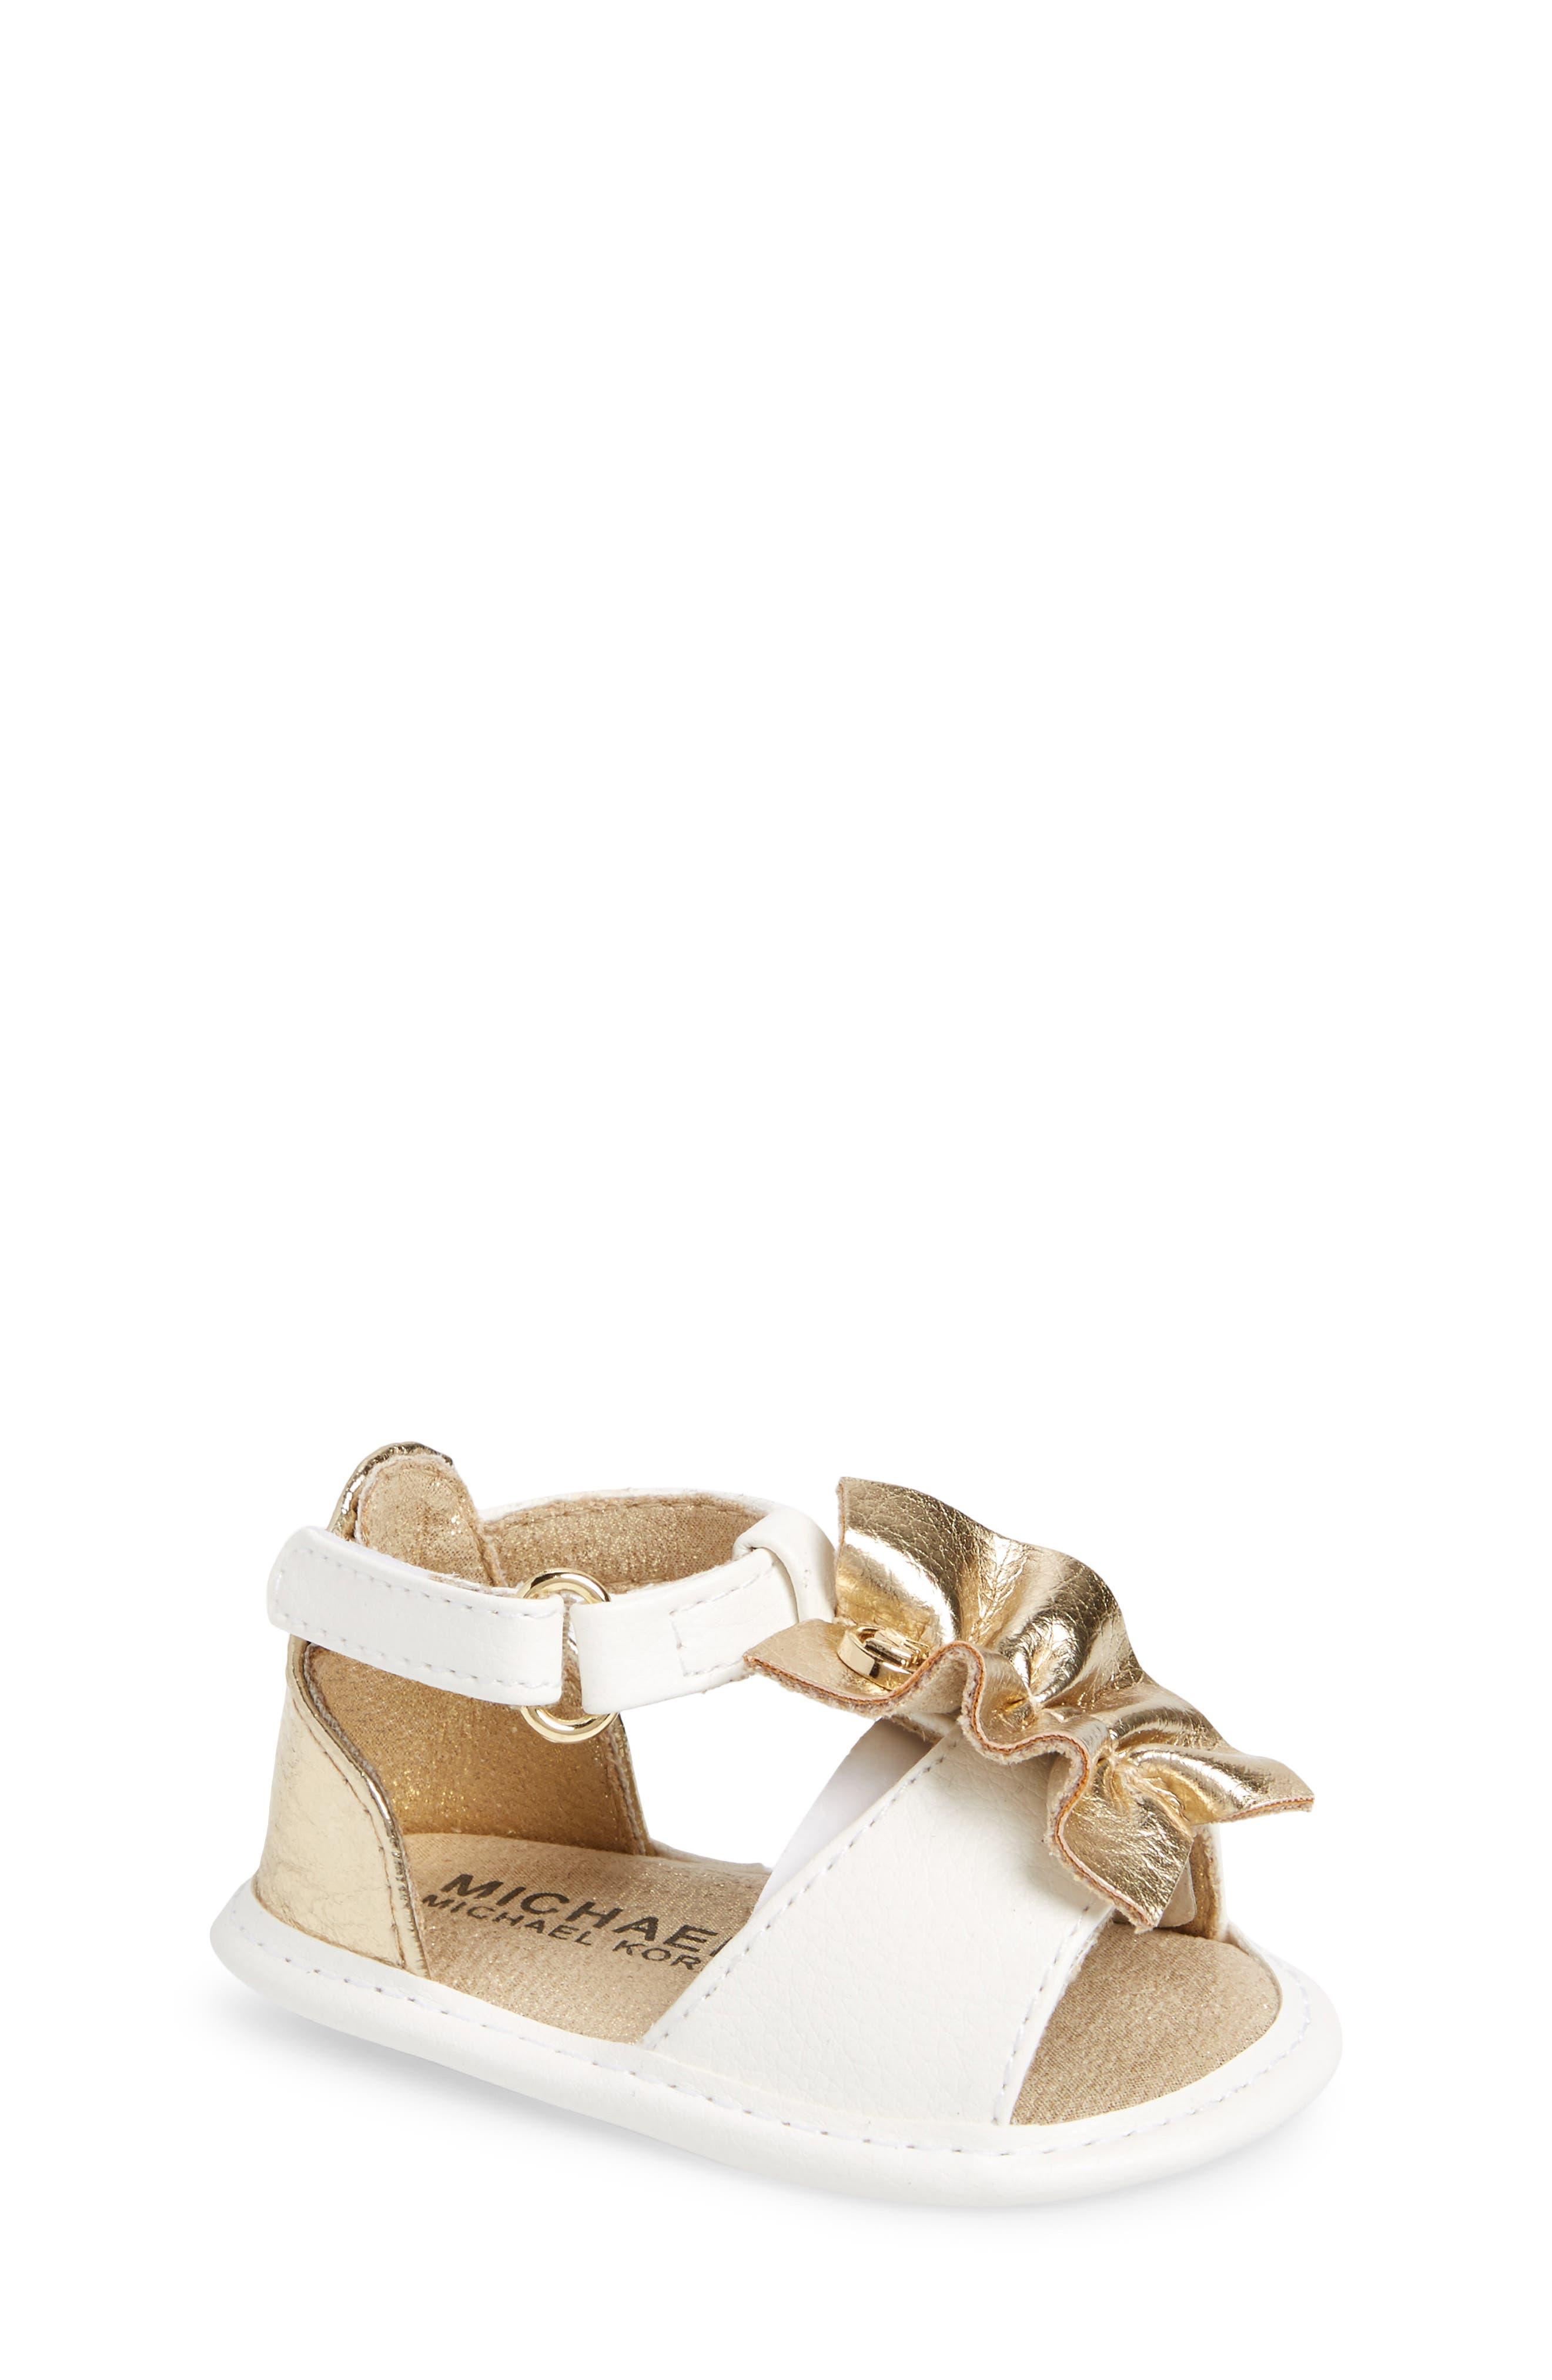 Clue Sandal,                         Main,                         color, White Gold